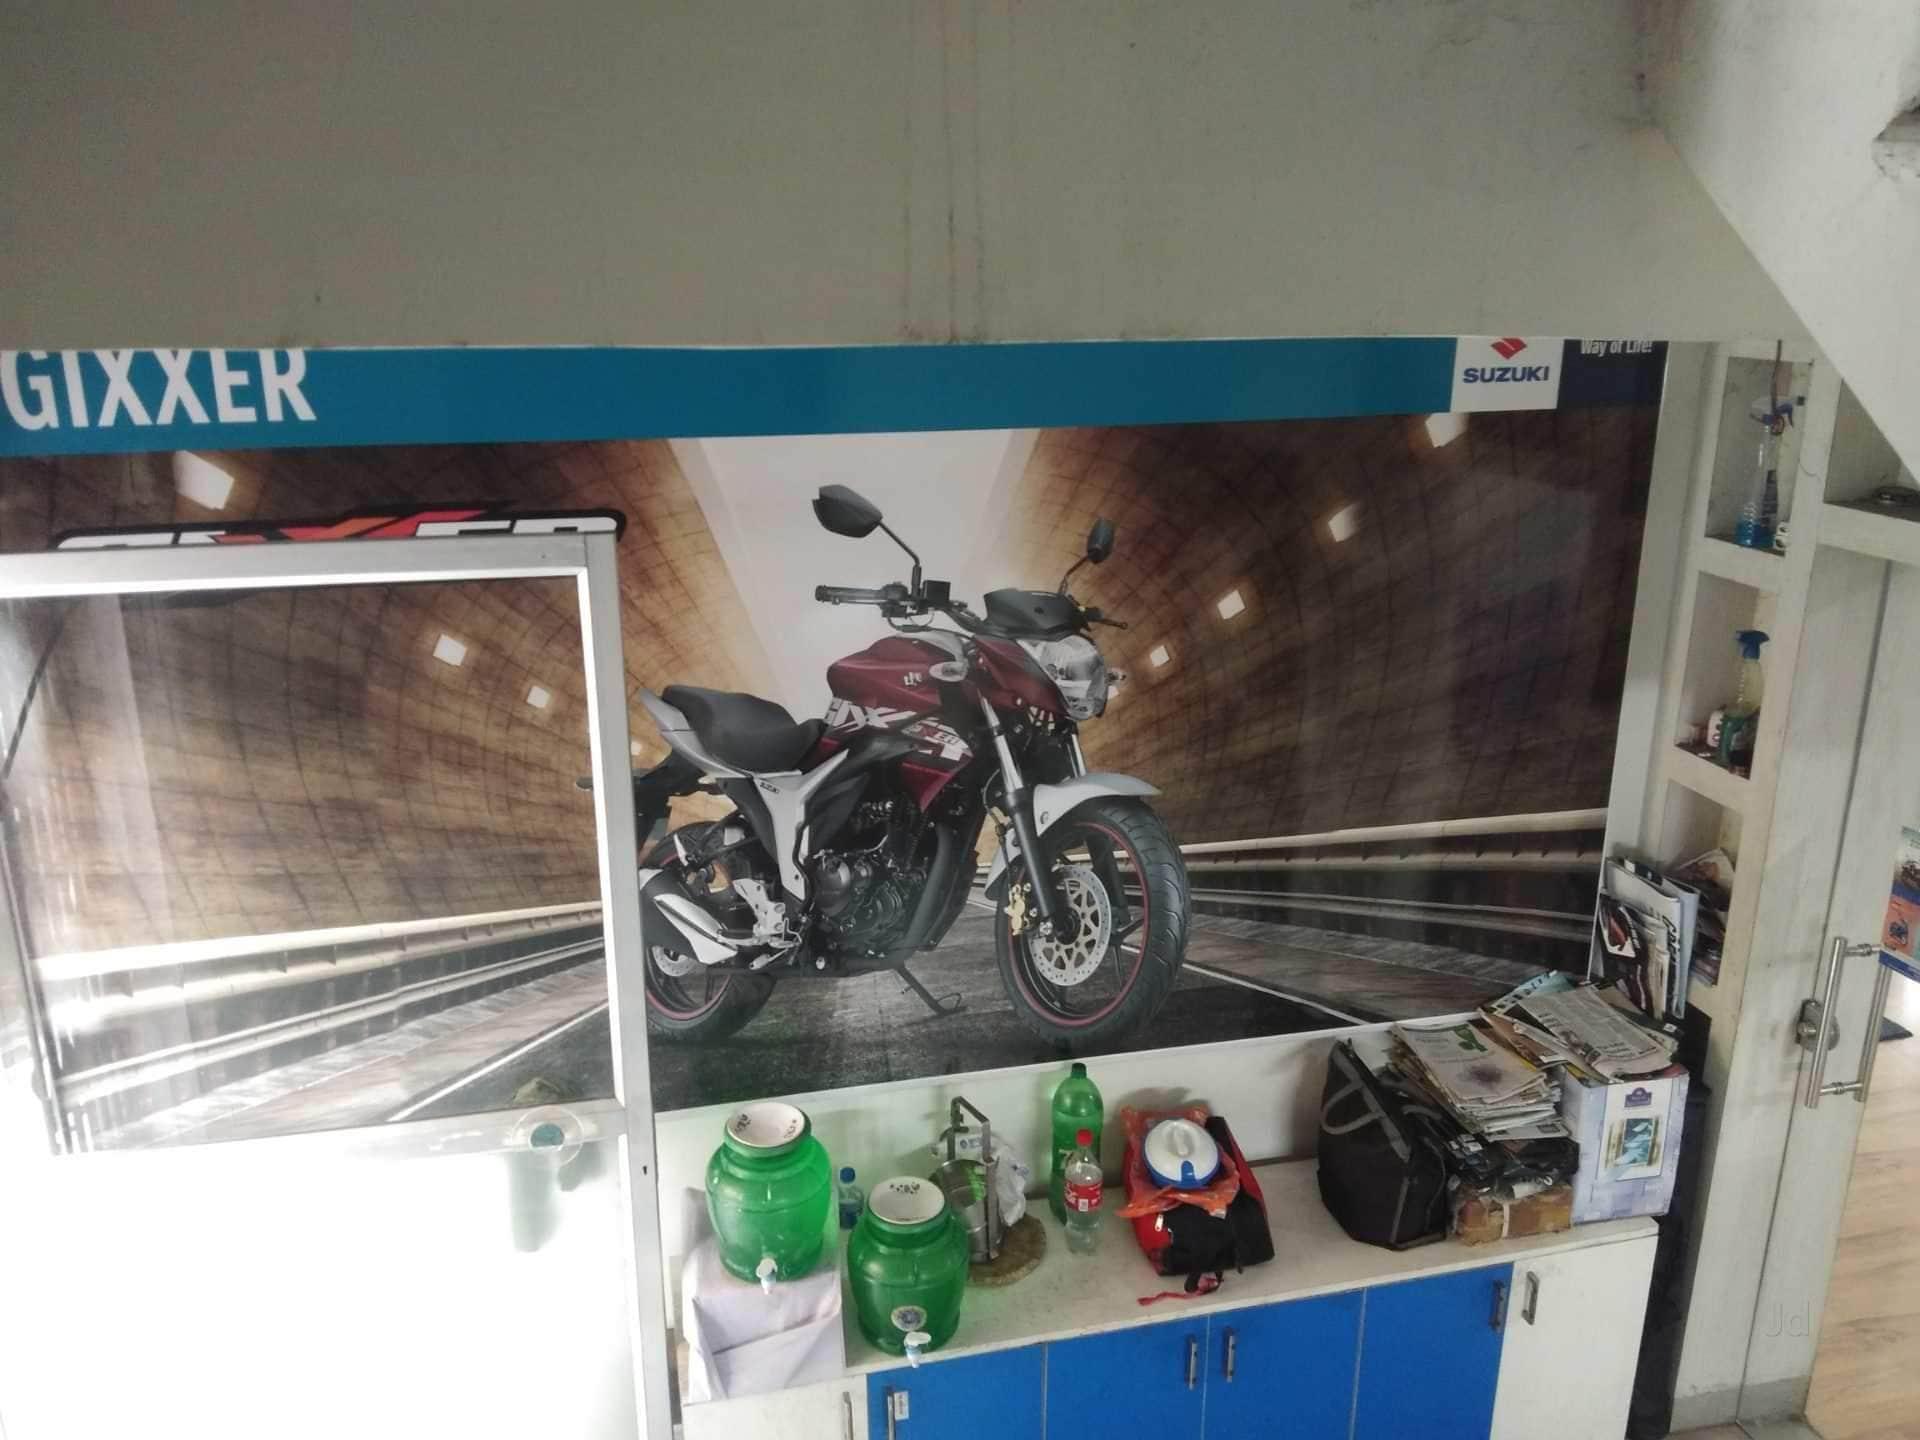 Top 30 Suzuki Bike Dealers in Kolkata - Best Suzuki Motorcycle